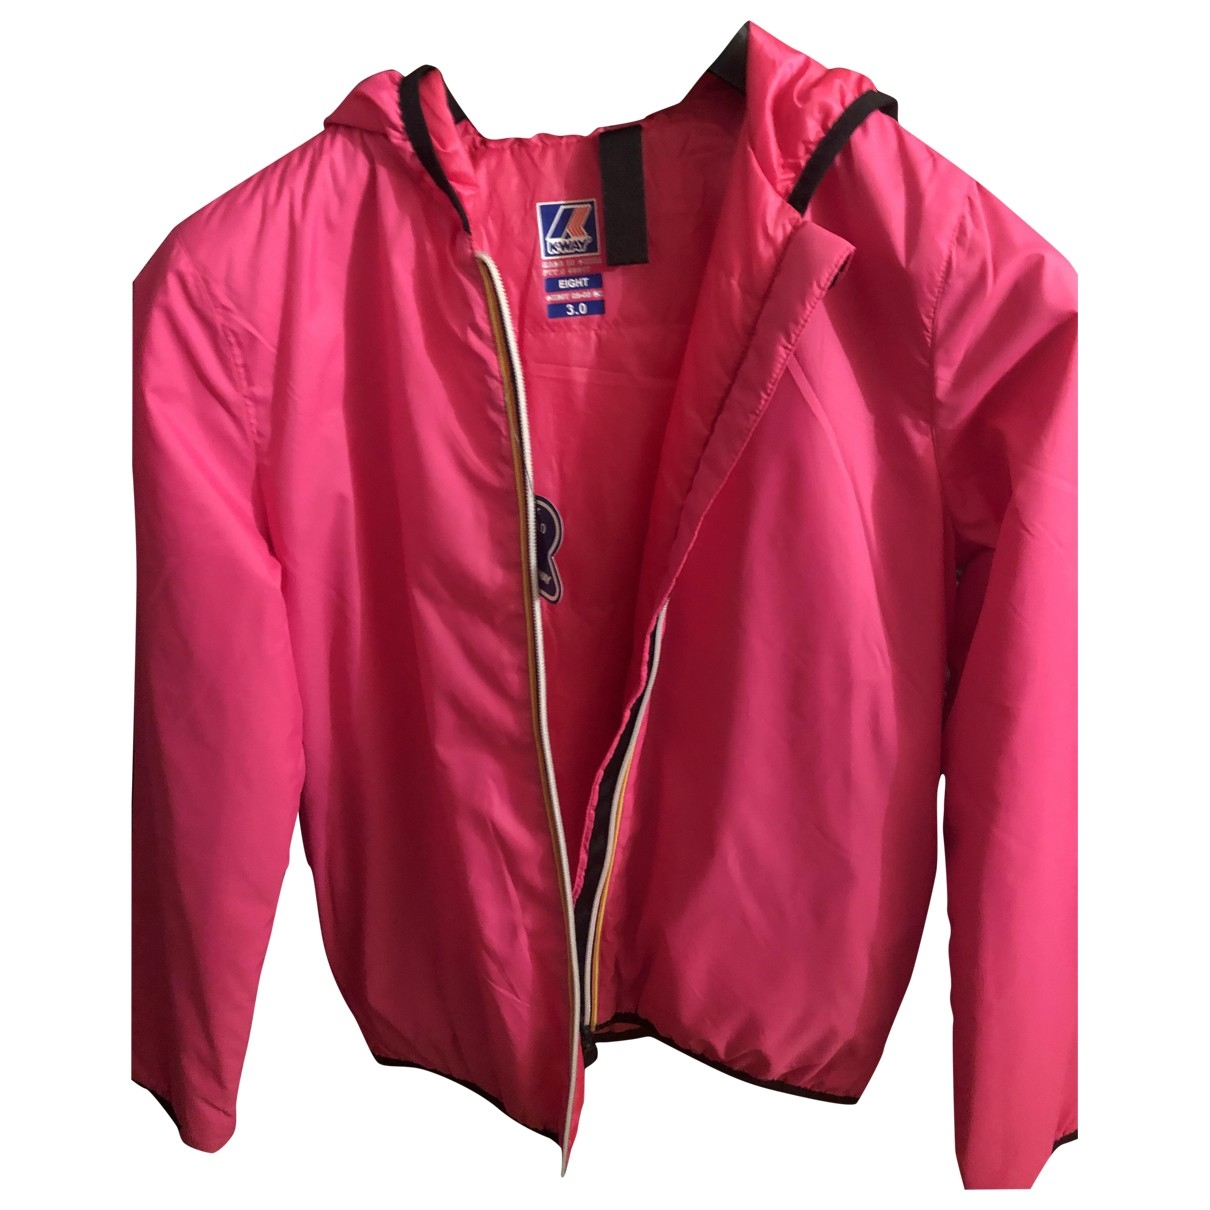 K-way - Veste   pour femme - rose